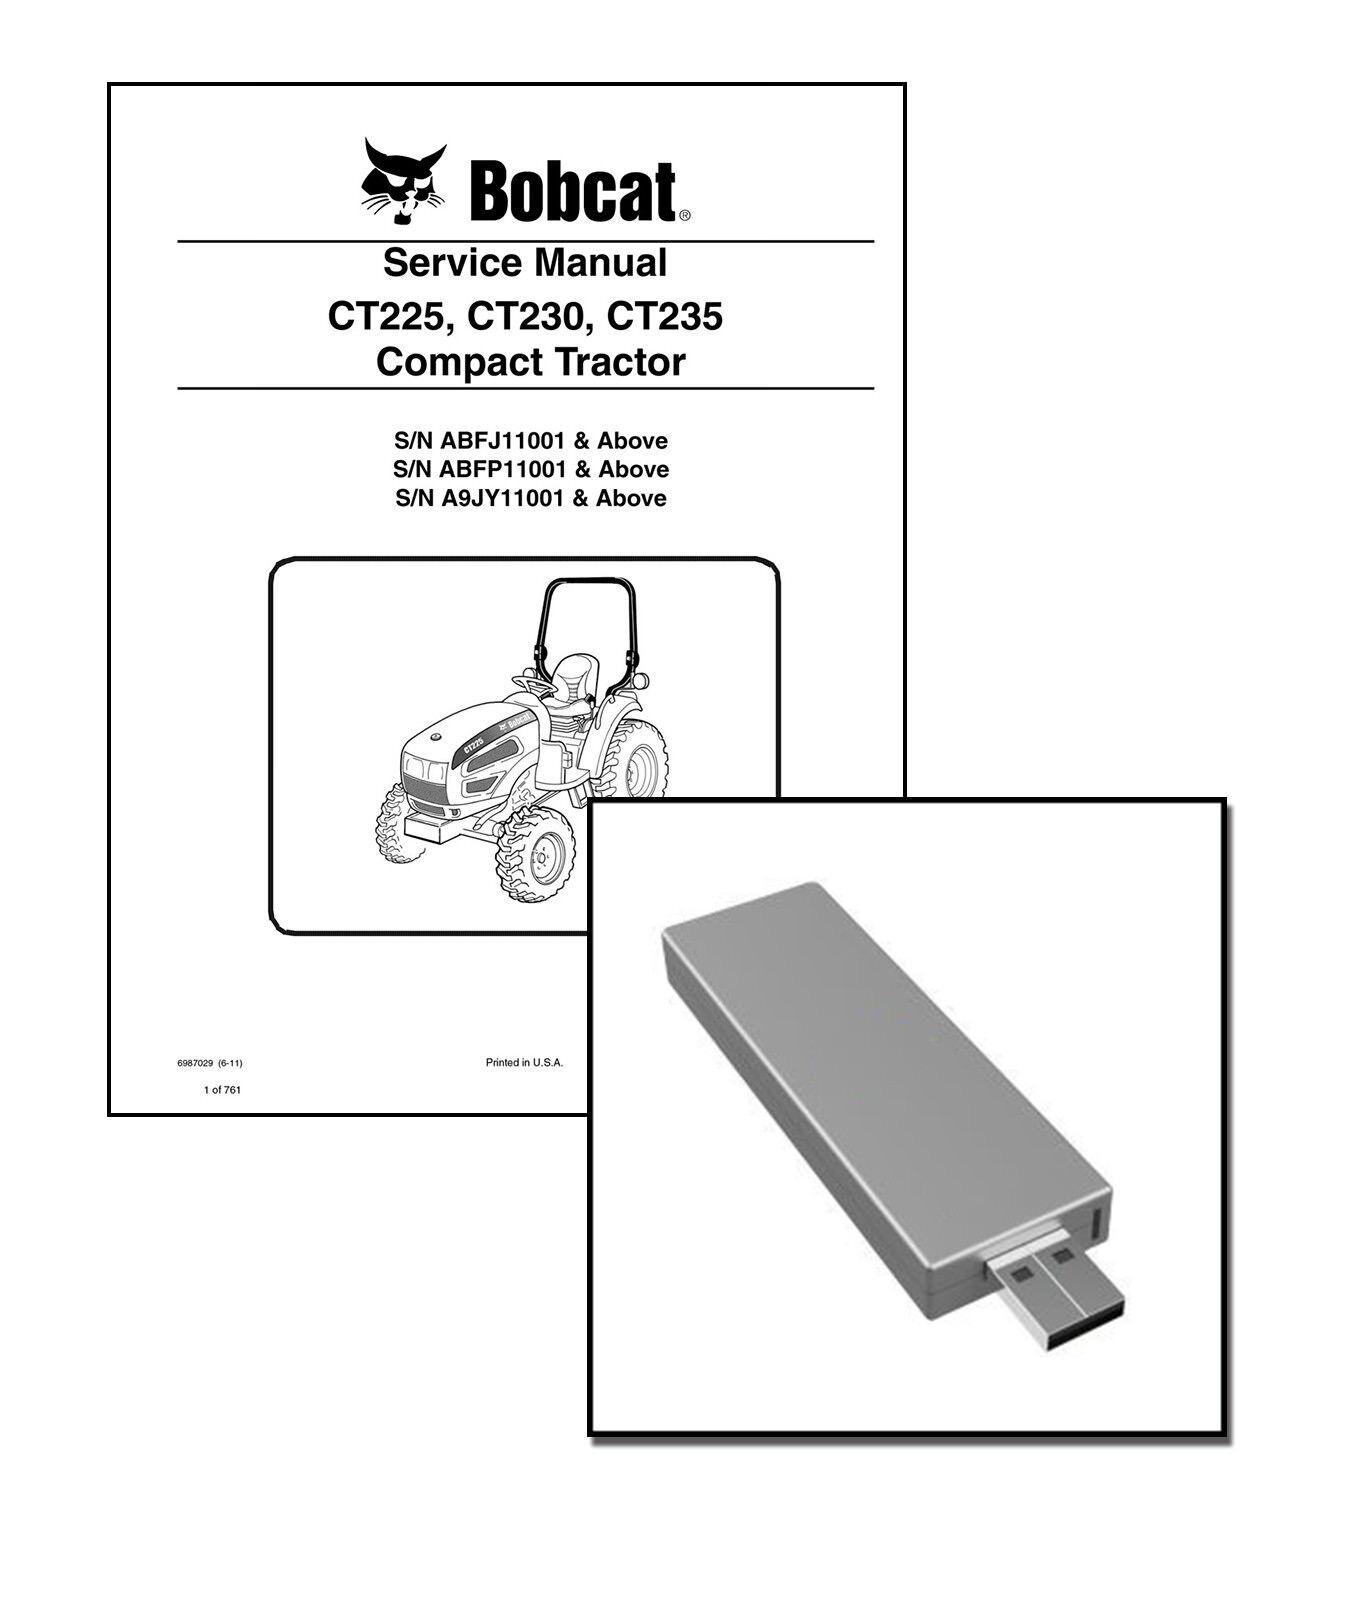 bobcat ct235 manual rh bobcat ct235 manual ecoflow us Toshiba Satellite Parts List Toshiba Disassembly Manual